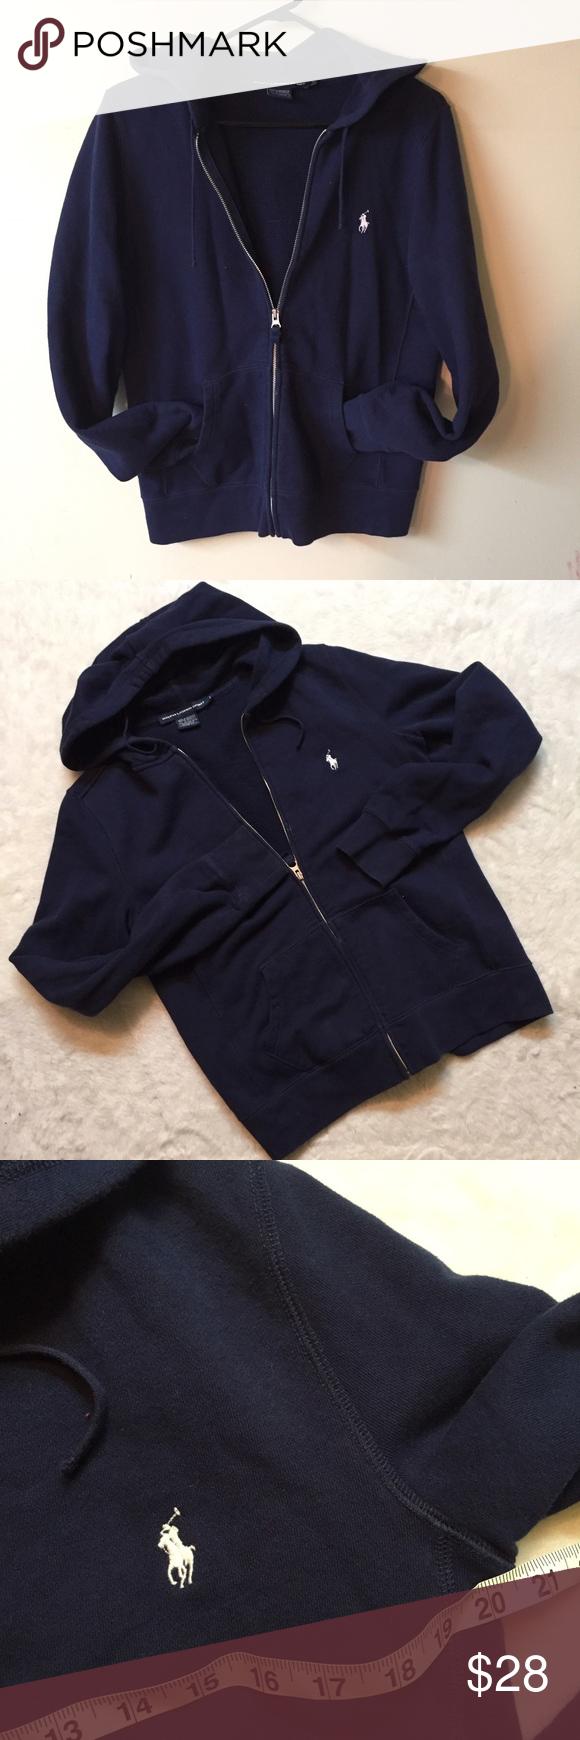 Polo Ralph Lauren sport large hooded sweatshirt Good condition!! Super comfy!! Polo by Ralph Lauren Tops Sweatshirts & Hoodies